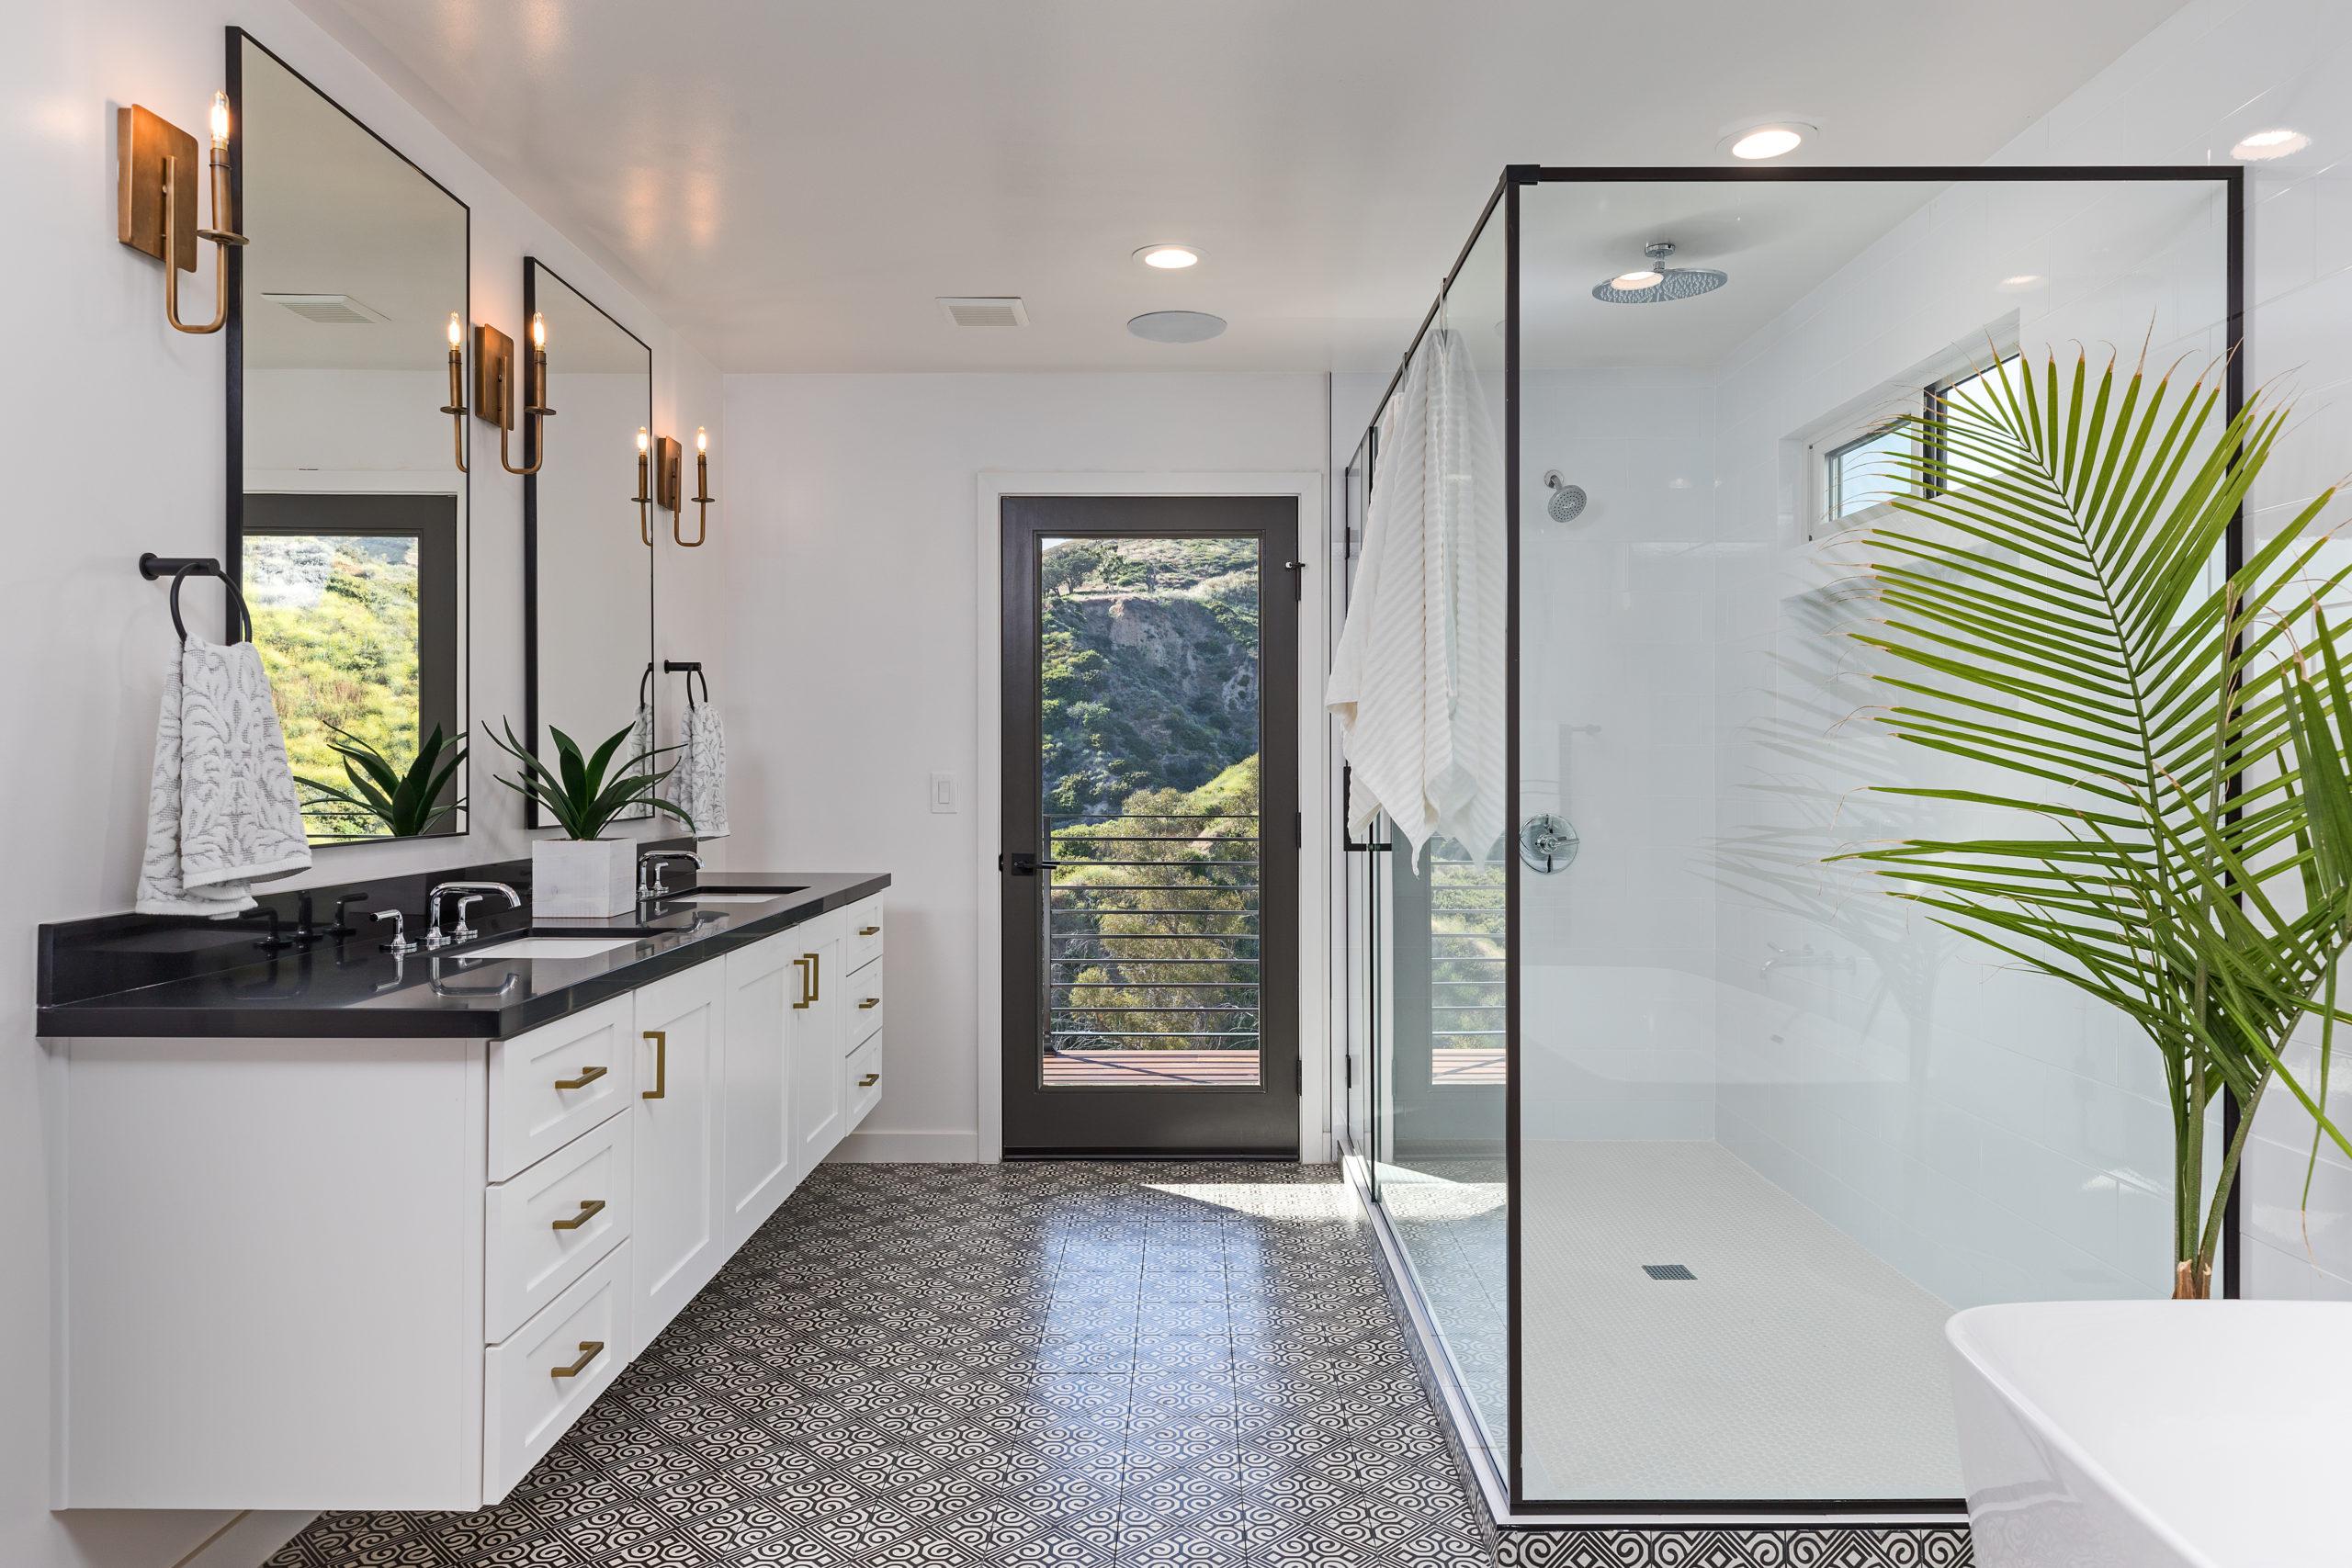 Photo of a contemporary looking bathroom.